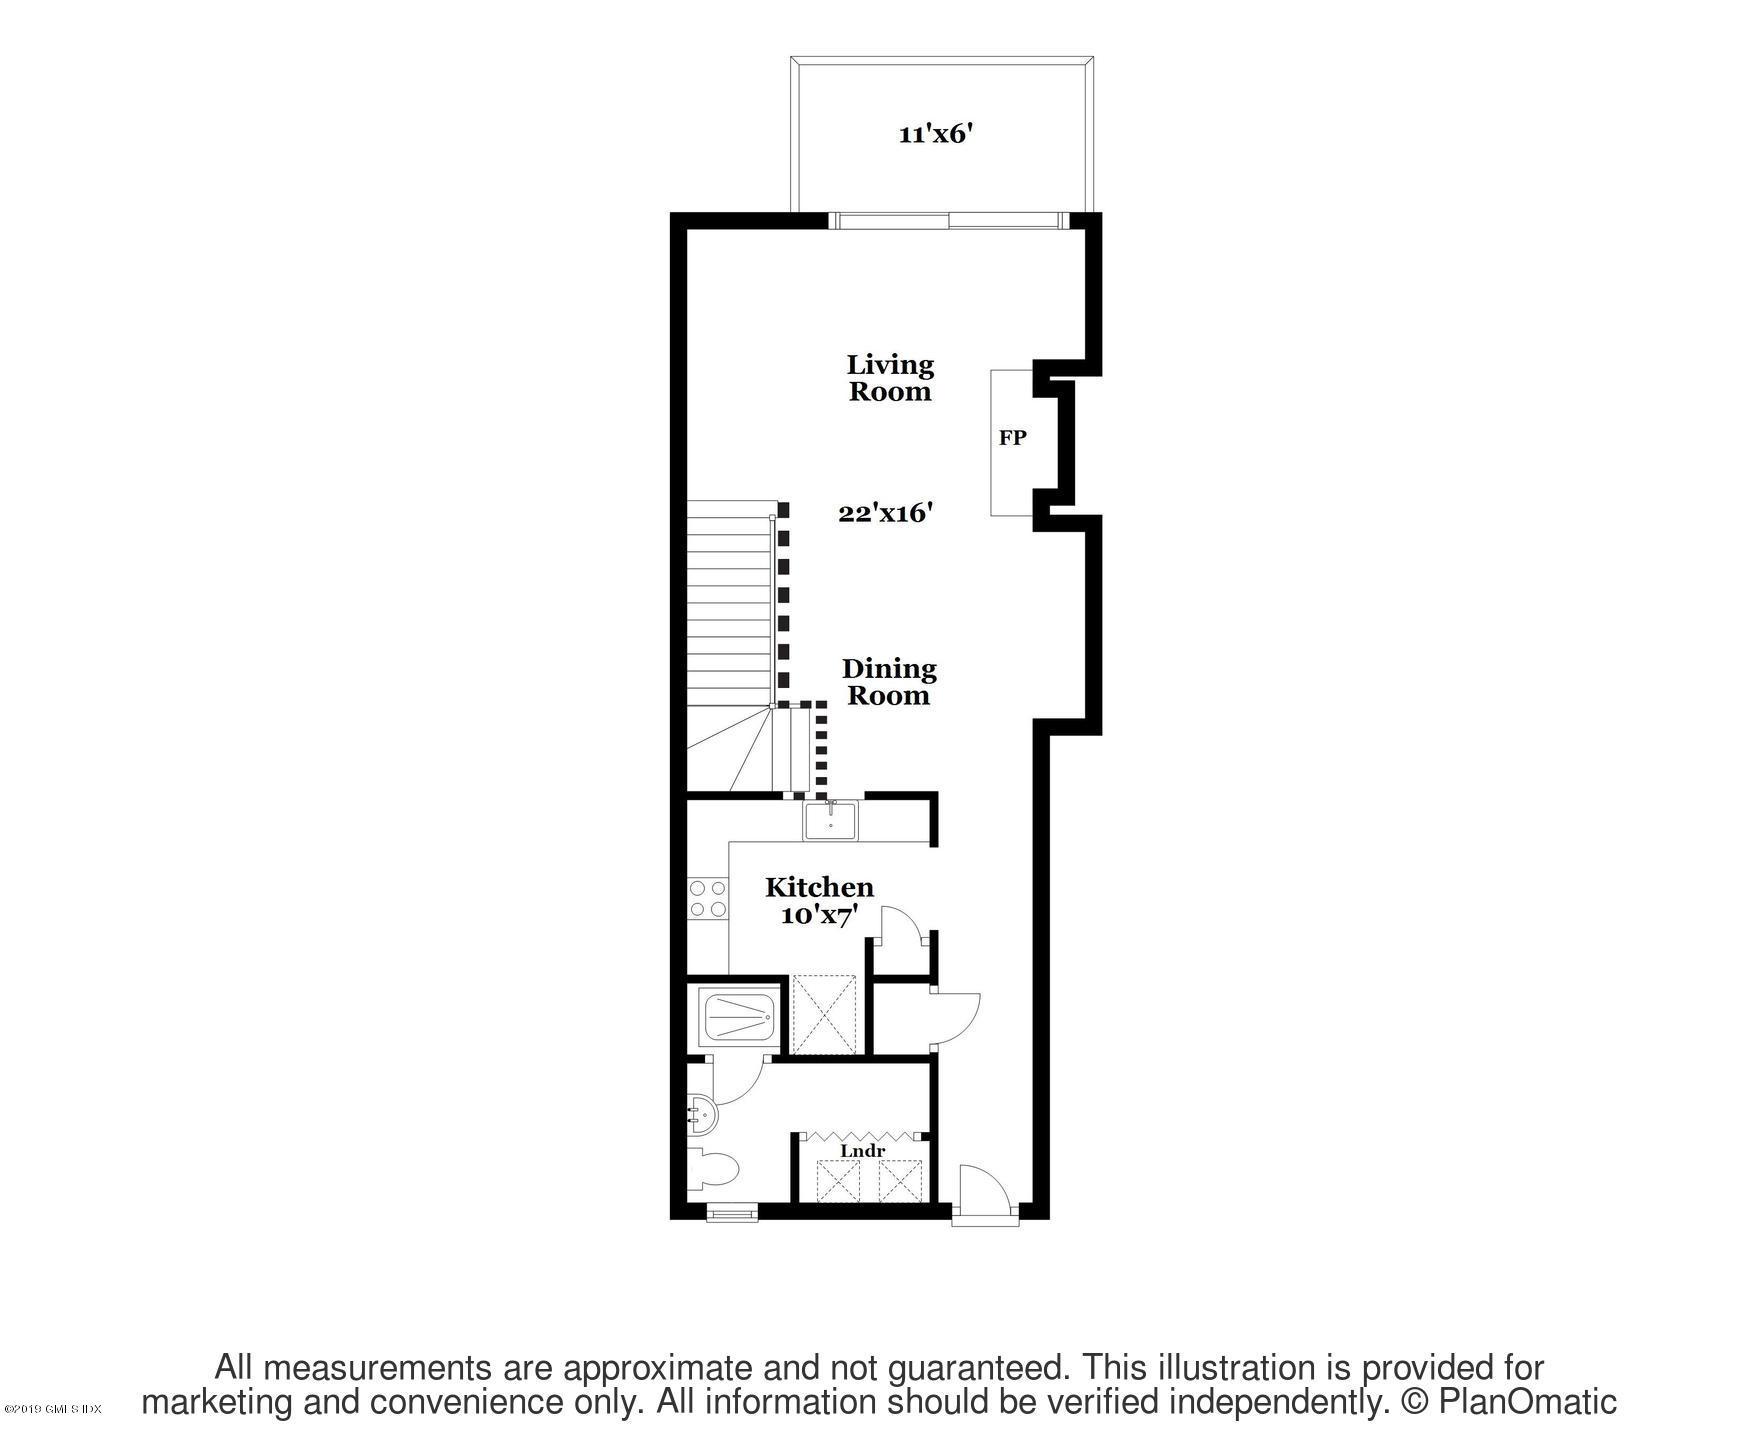 7 River Road,Cos Cob,Connecticut 06807,2 Bedrooms Bedrooms,2 BathroomsBathrooms,Condominium,River,106175